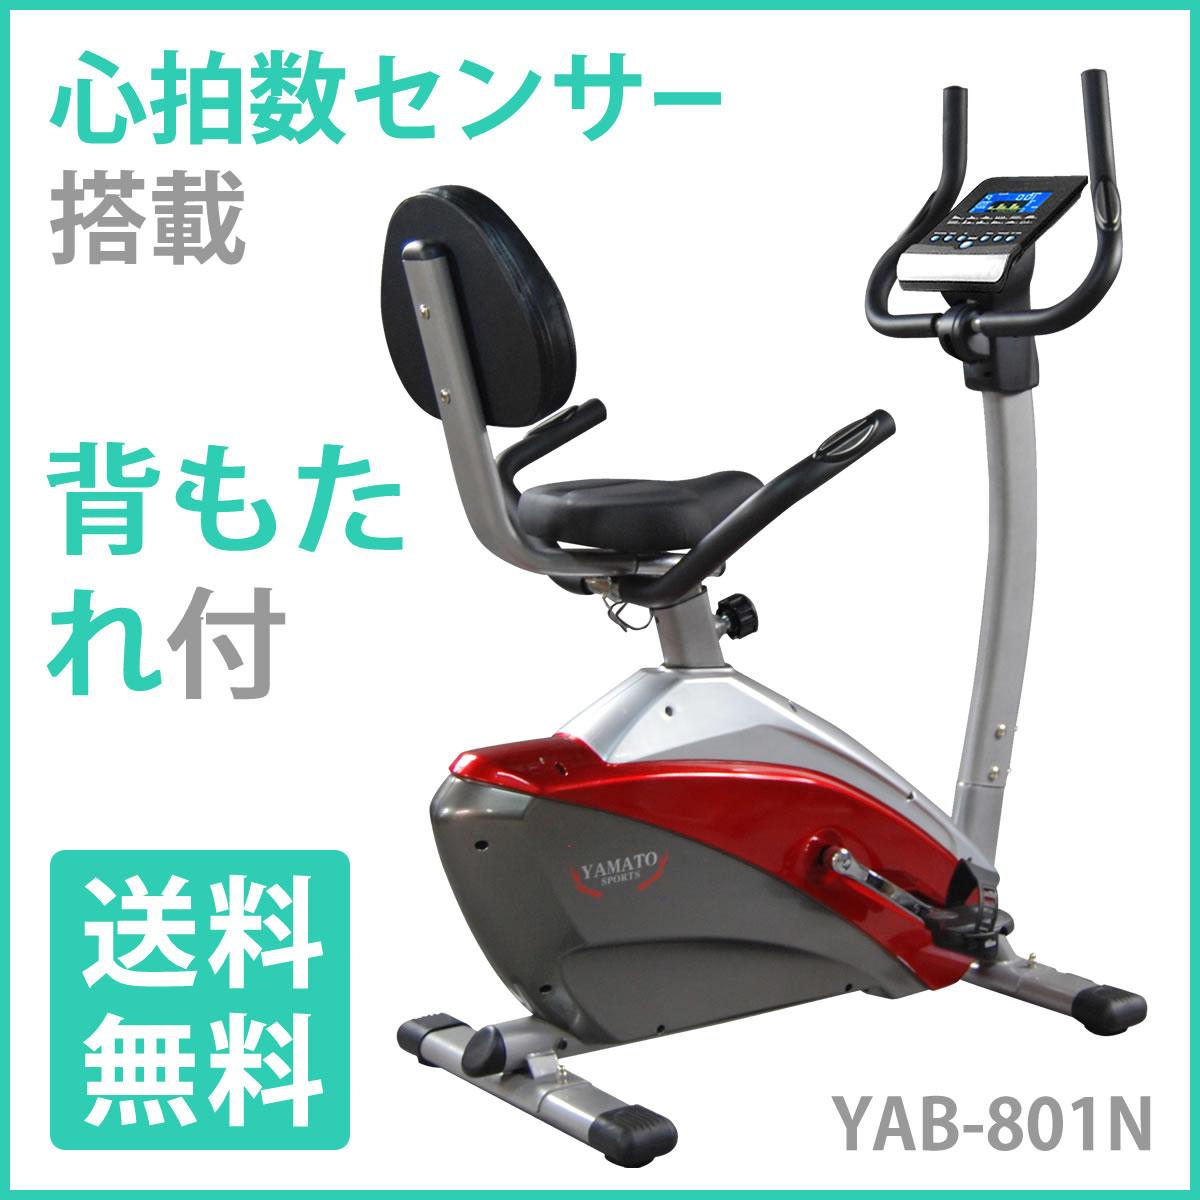 YAB-801N 繧ェ繝シ繝「繝�繝�繧ッ繧「繝�繝励Λ繧、繝医ヰ繧、繧ッ